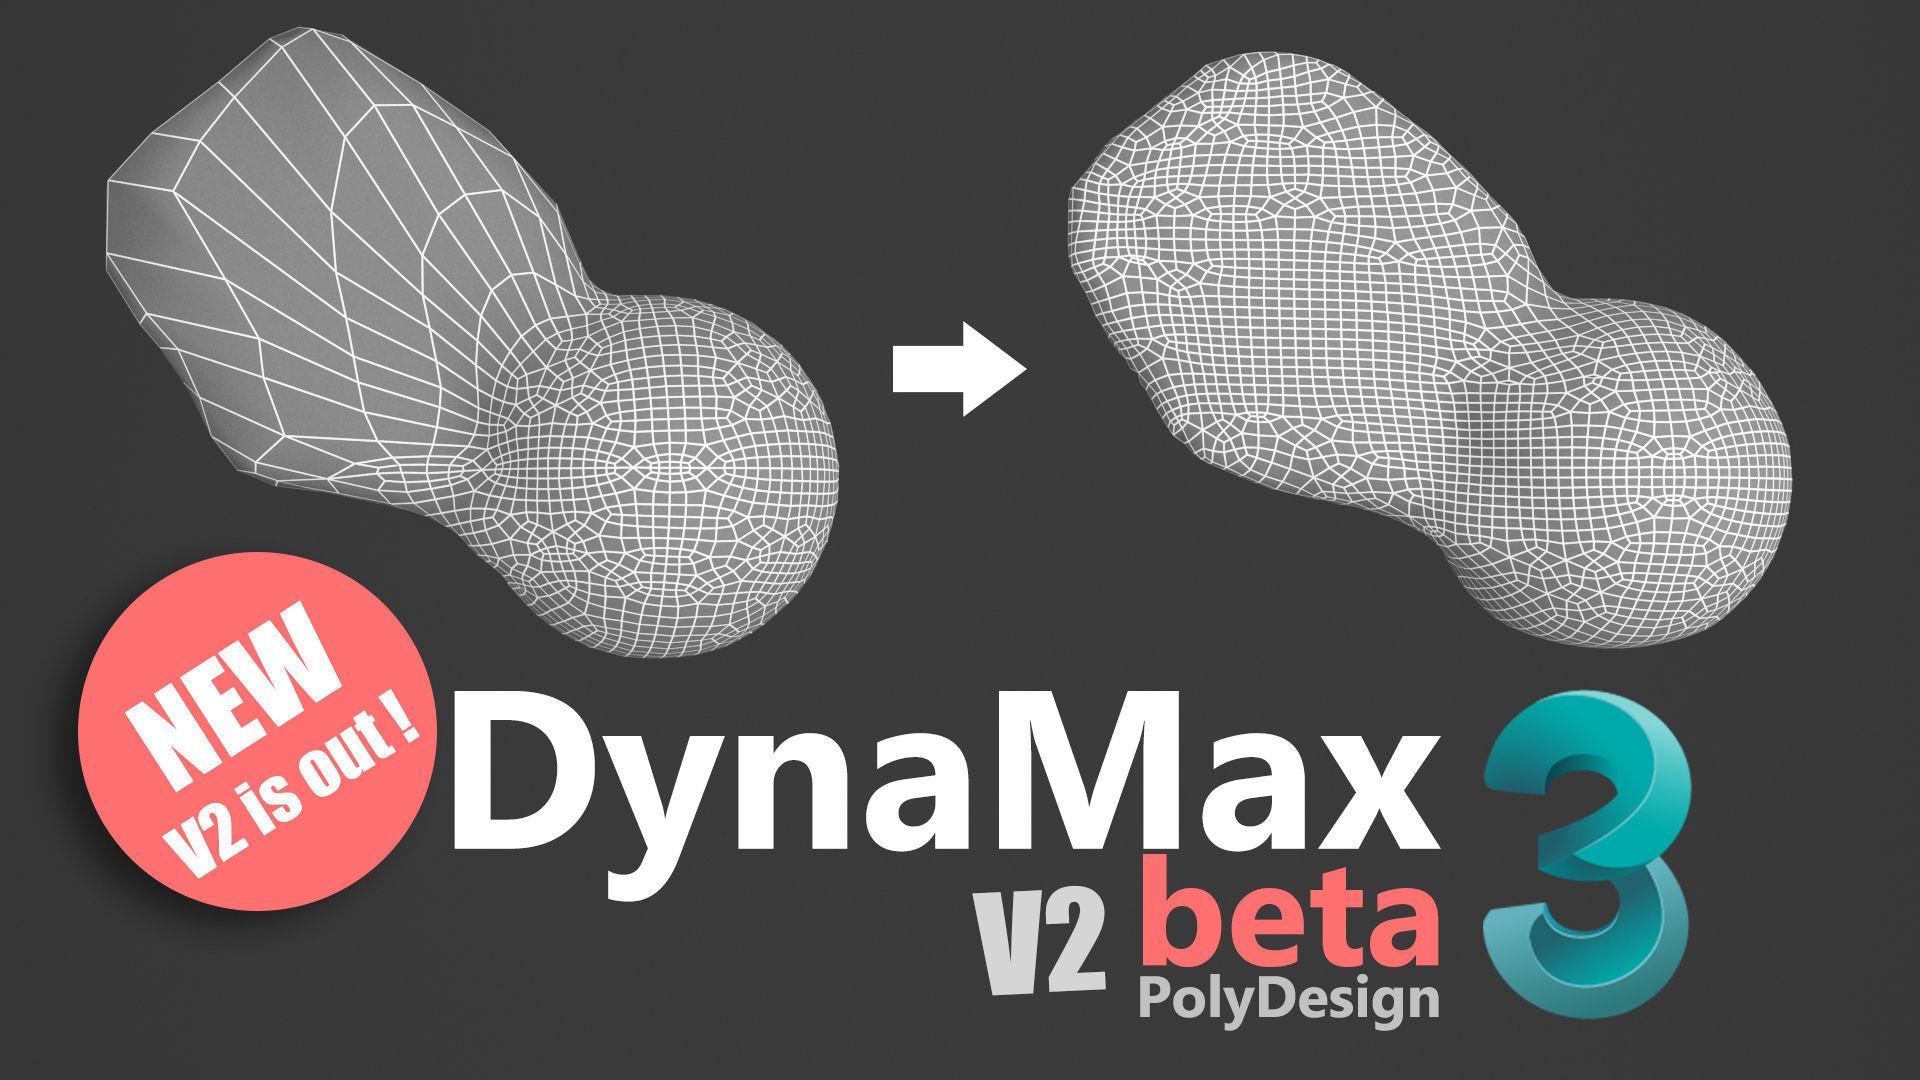 DynaMax V2 for 3dsmax